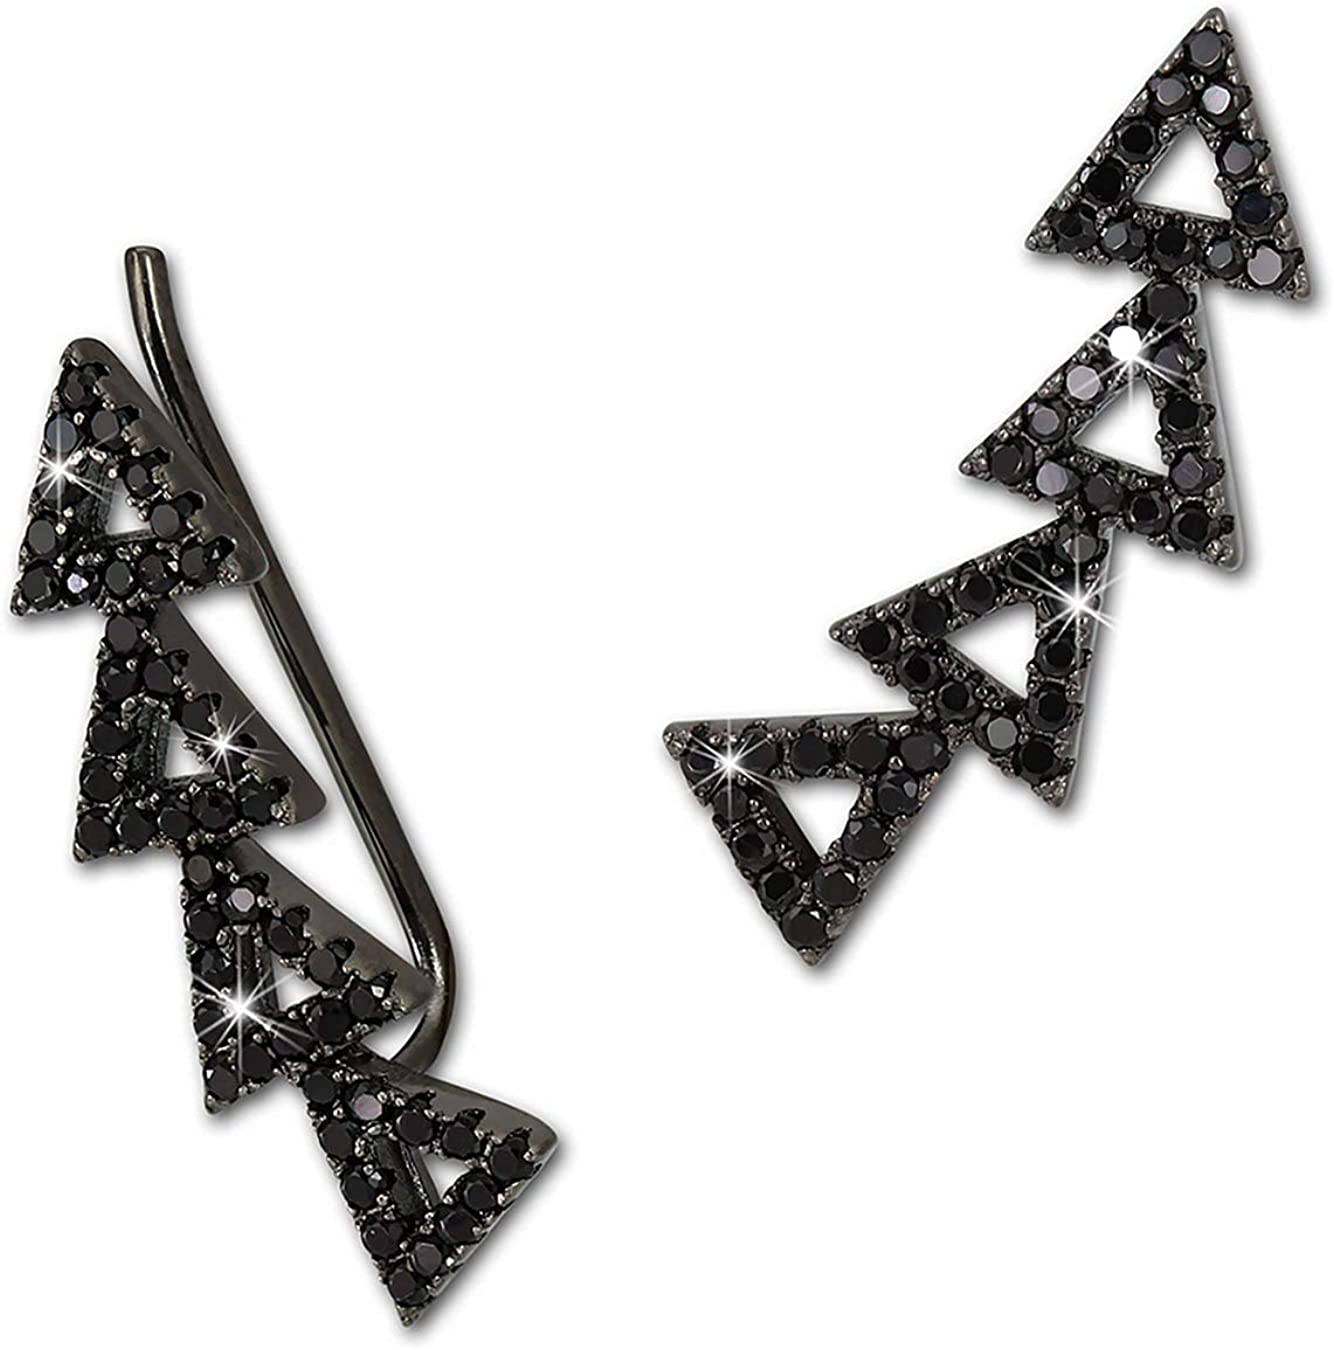 SilberDream Ear Cuff Triangles Zircons noirs Boucles doreilles en Argent GSO426S